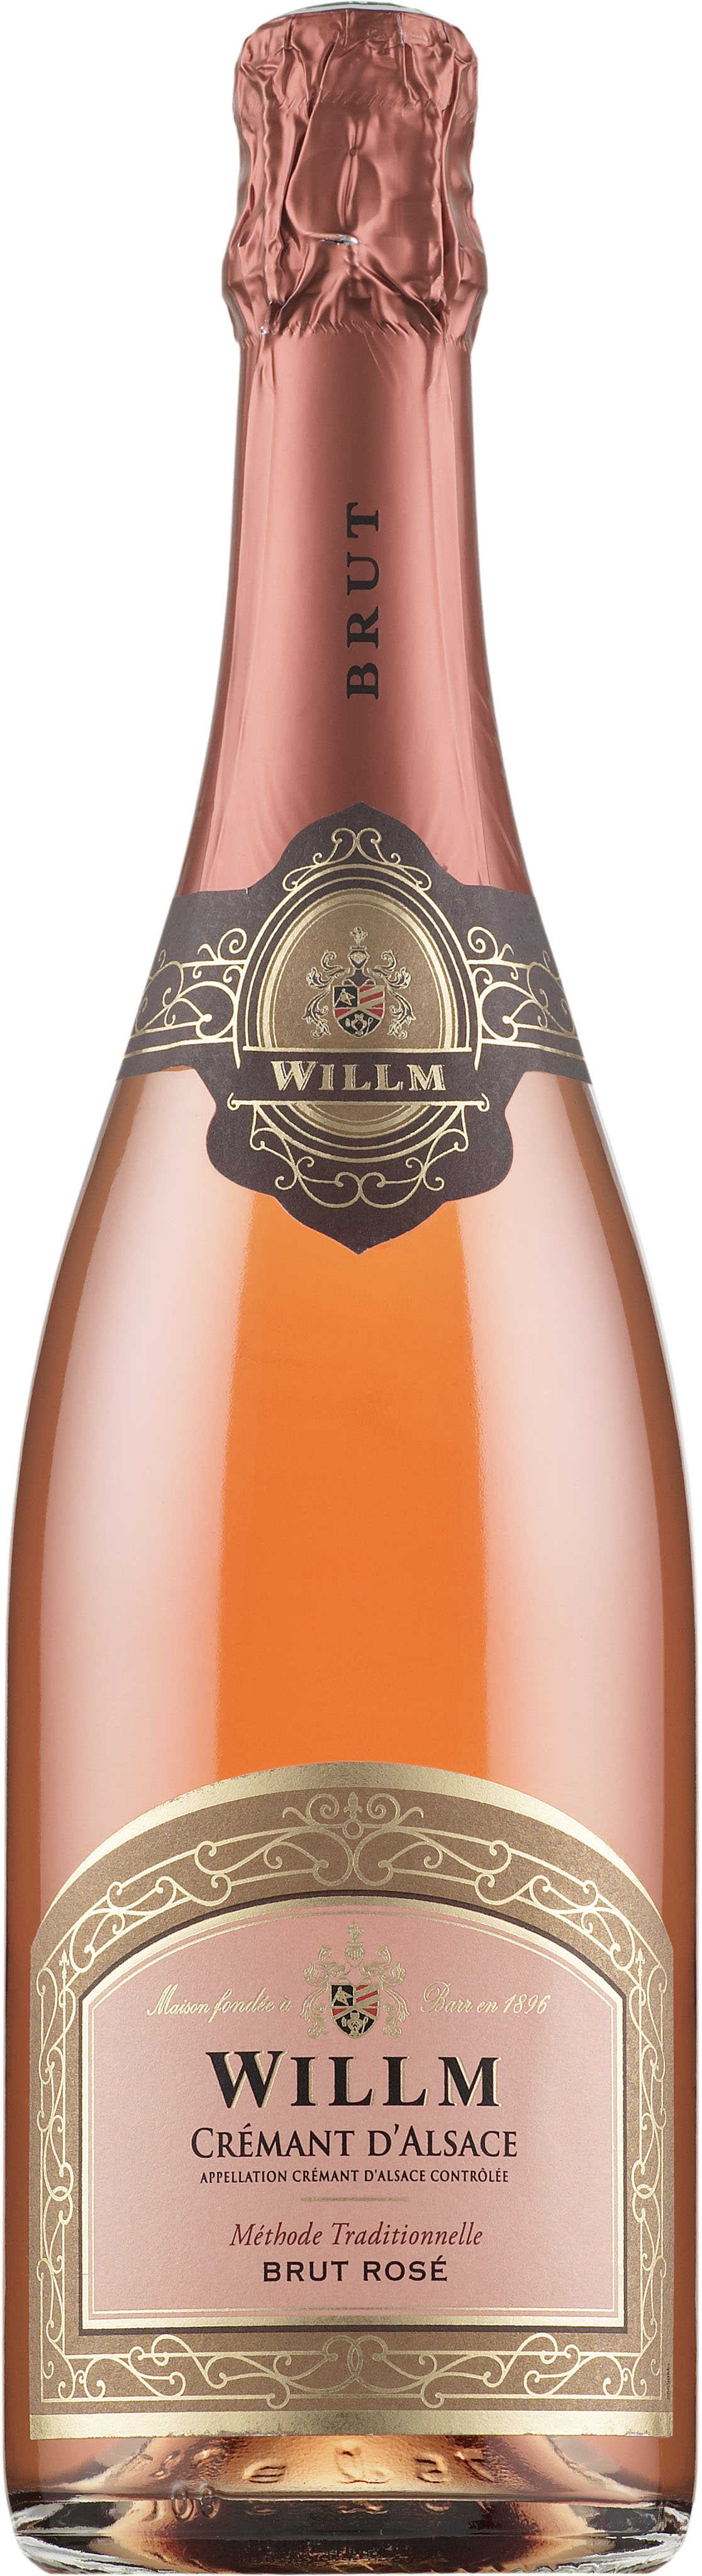 Willm Cremant d'Alsace Brut Rose